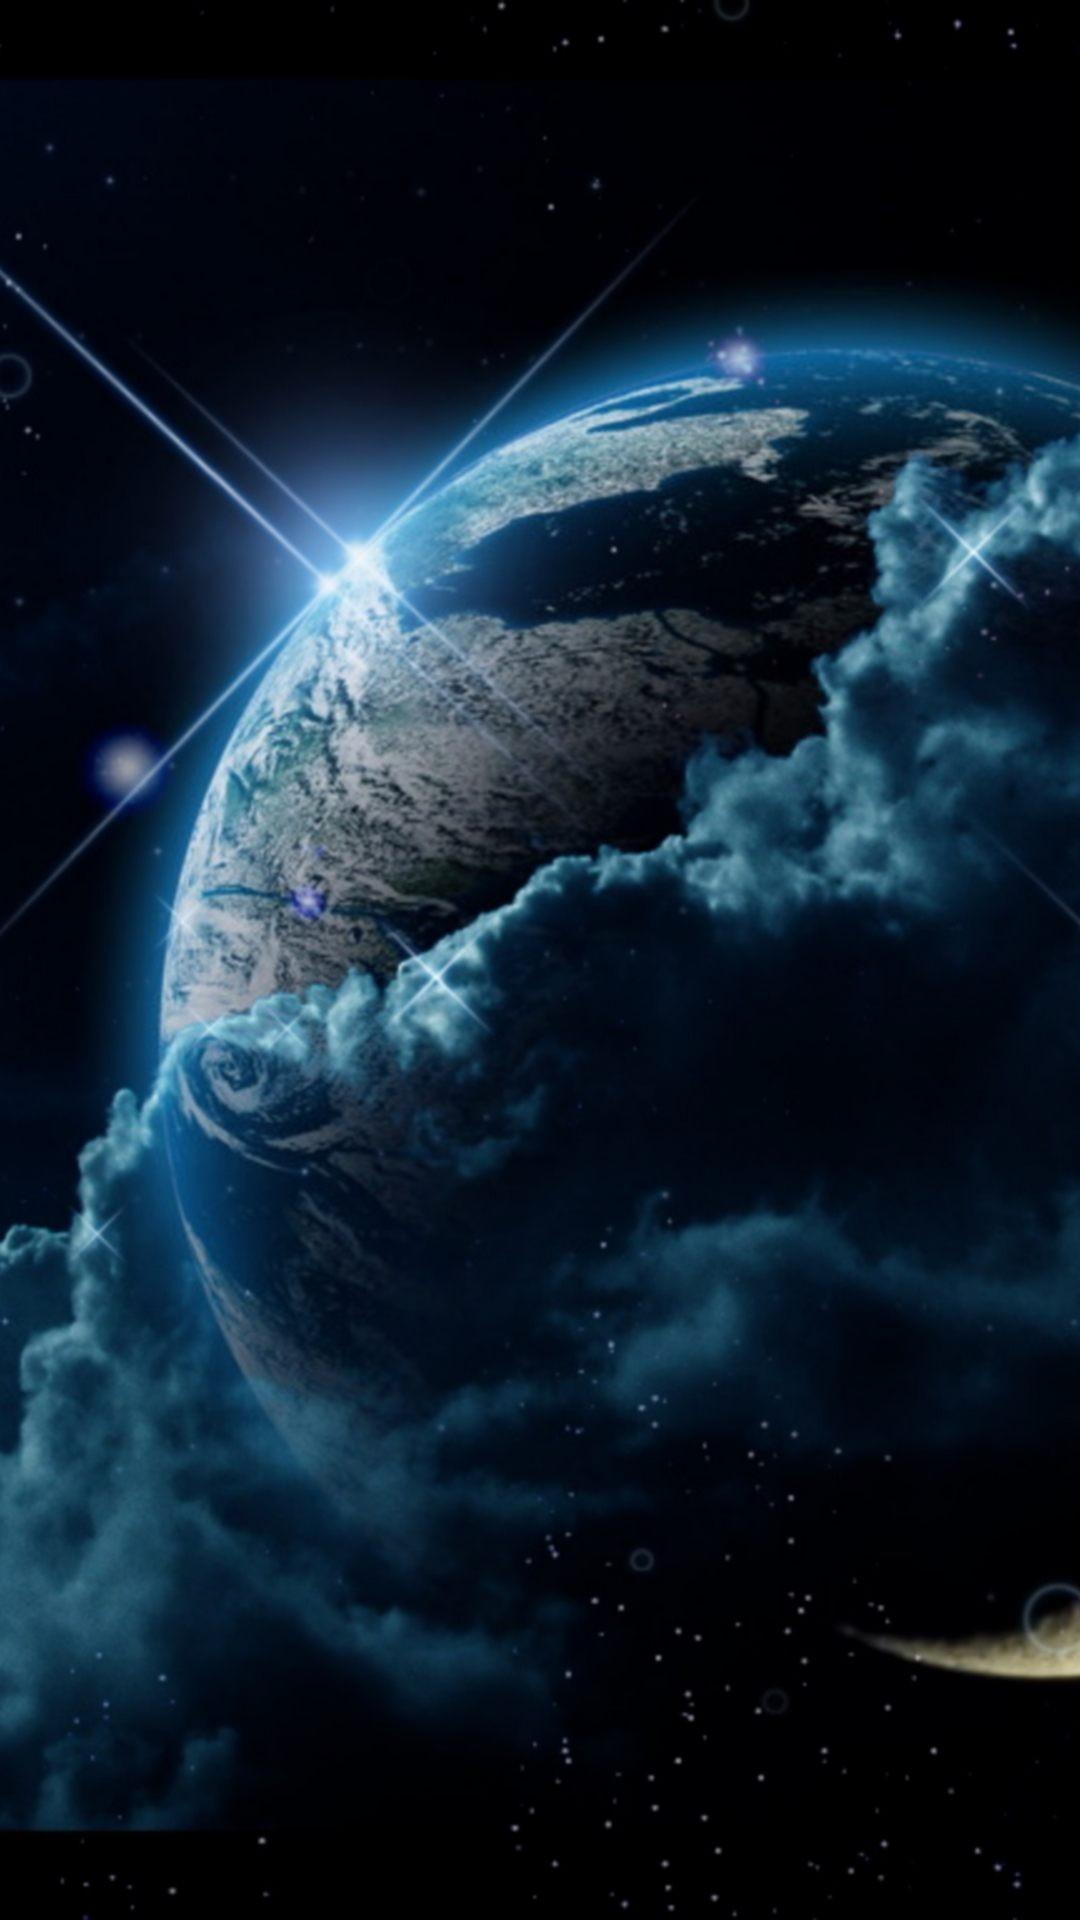 Iphone Earth Hd Wallpaper Iphone 465439 Hd Wallpaper